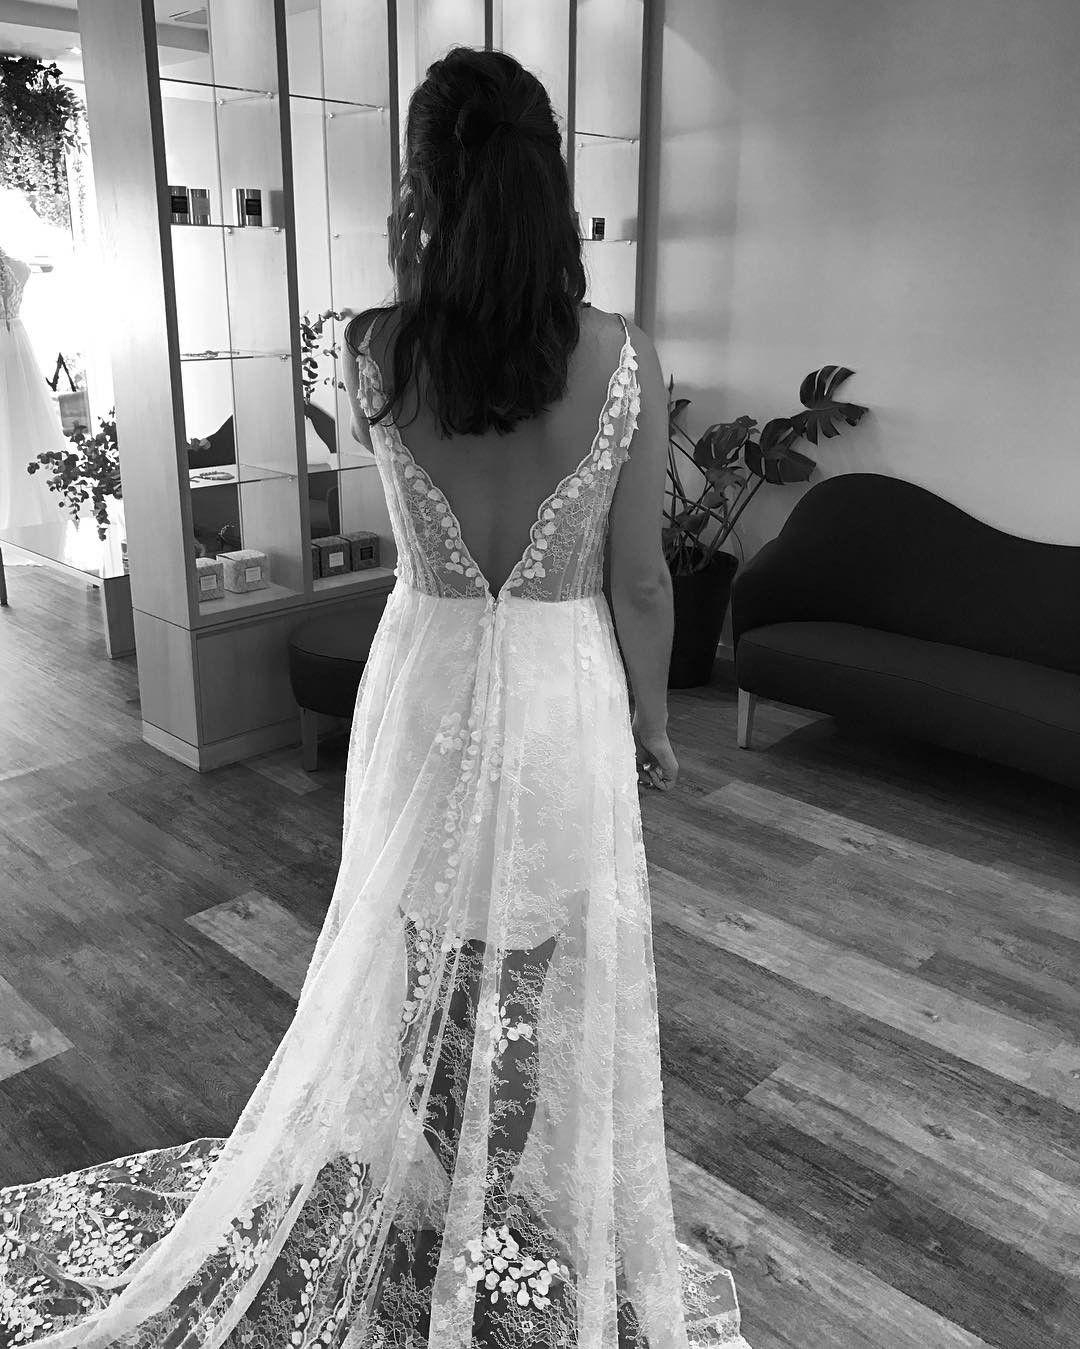 Couture Wedding Gowns Sydney: 3D Lace Wedding Dress - Mira Mandic Bride